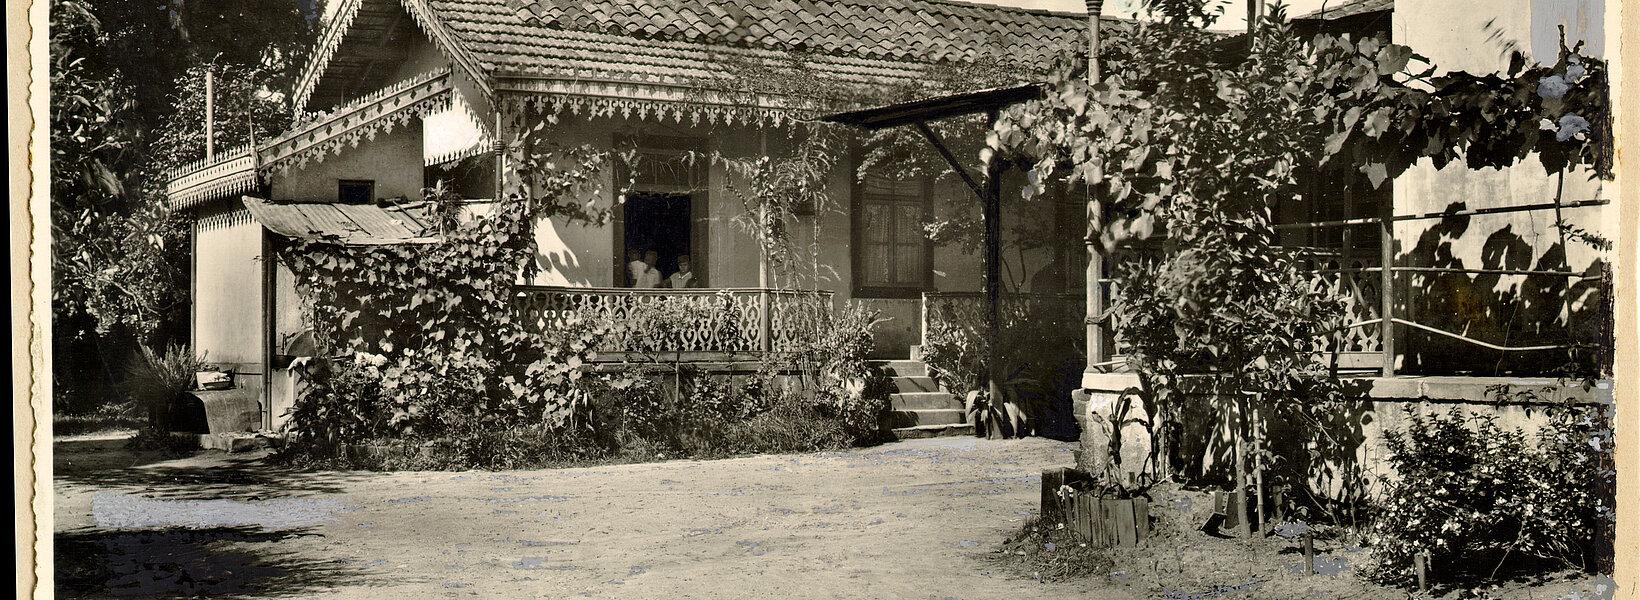 escola americana mackenzie 1870